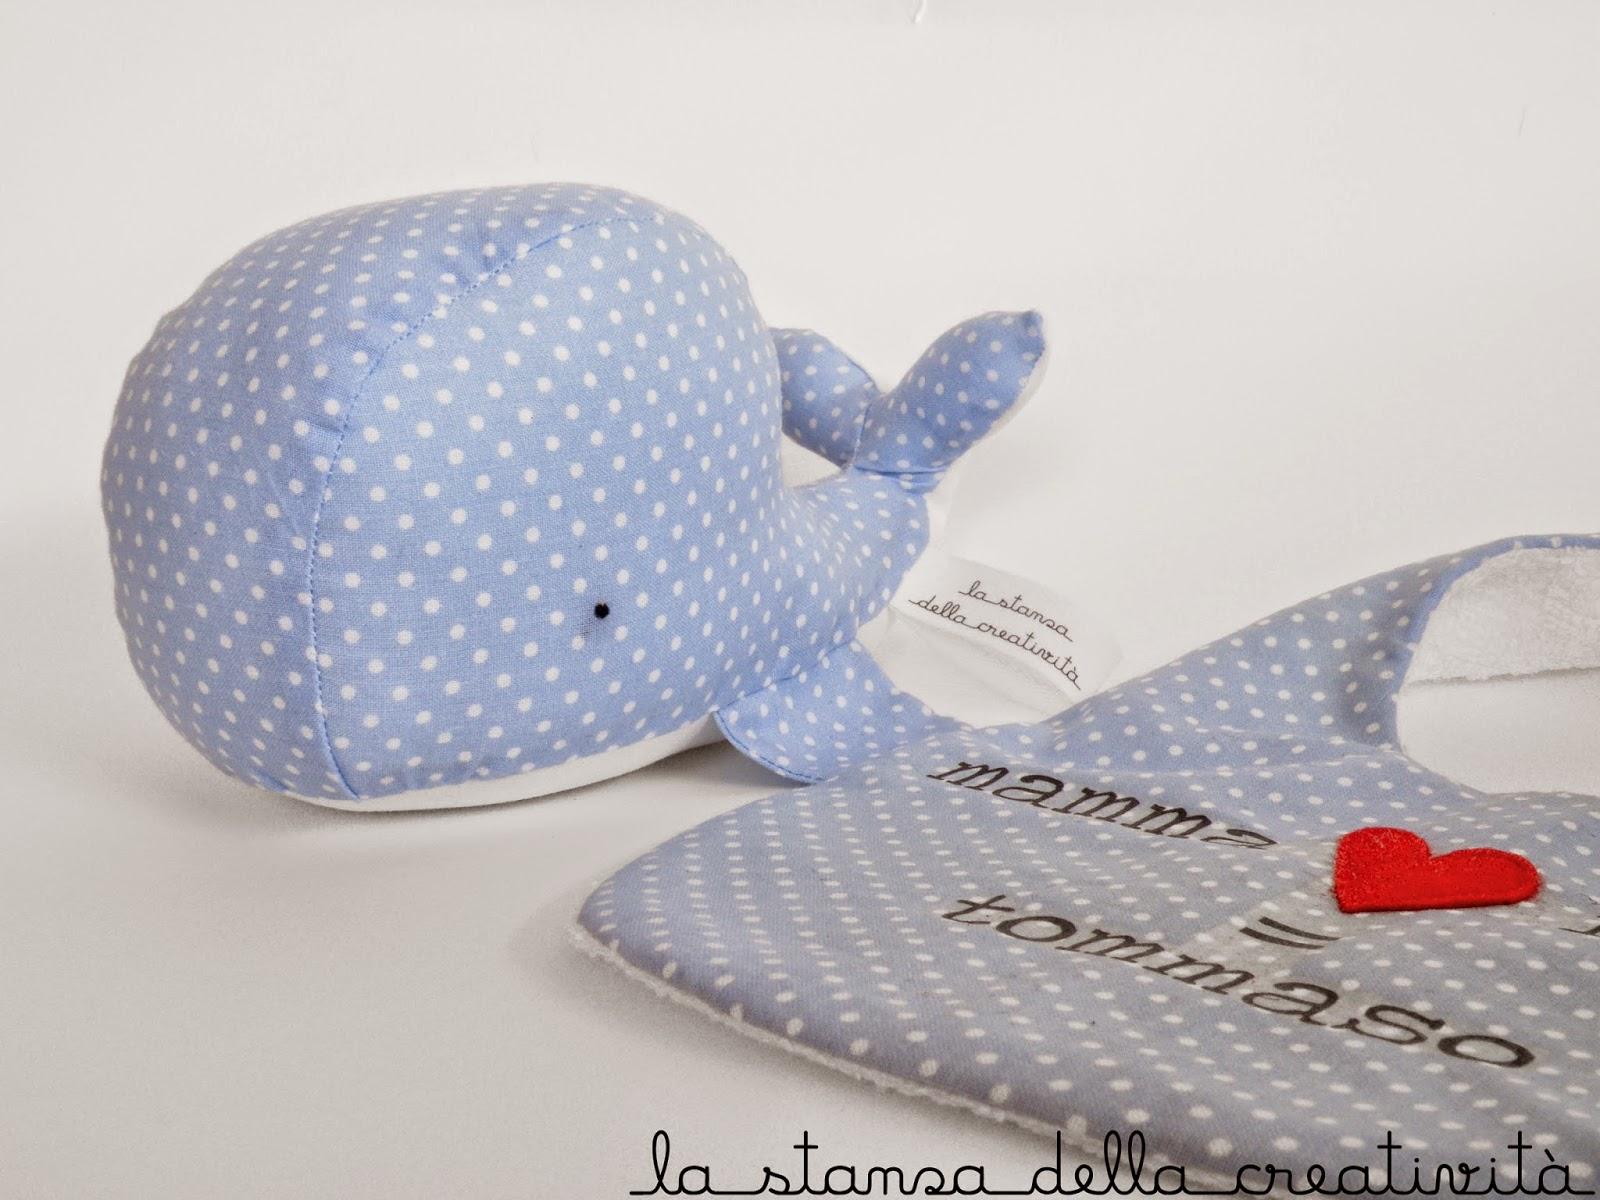 Balena e bavaglia